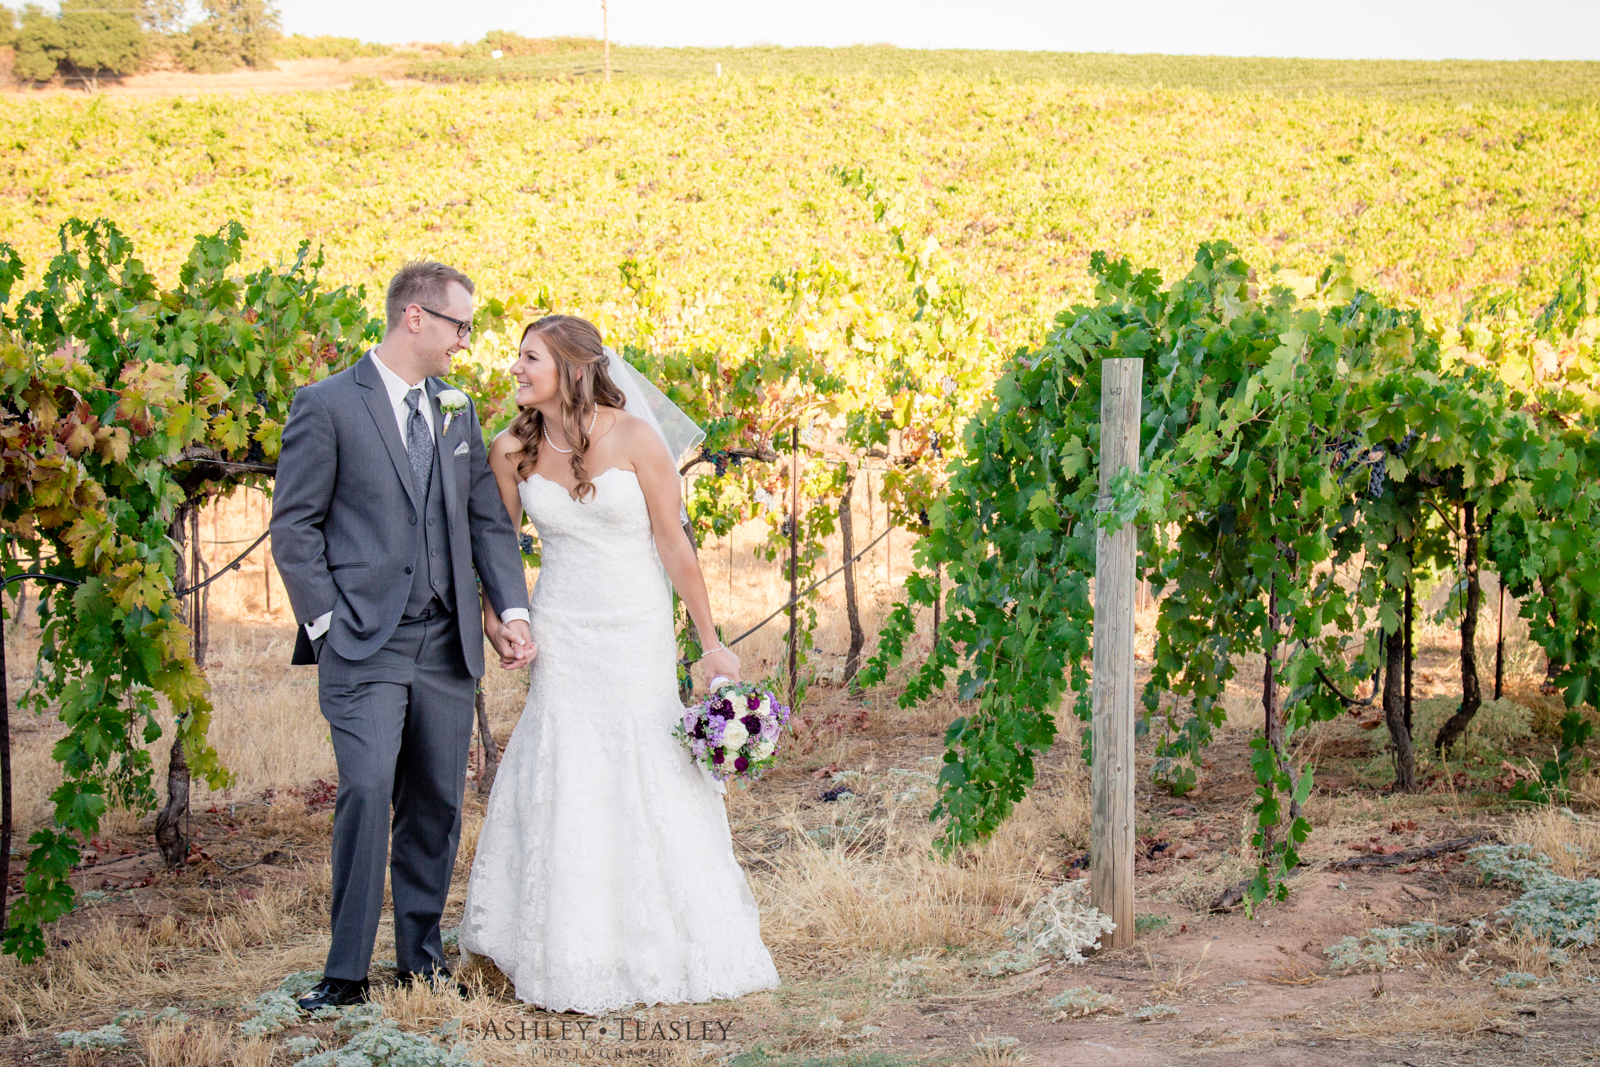 Ashley Teasley Photography - Amador Cellars Winery - Sacramento Wedding Photographer-130.JPG